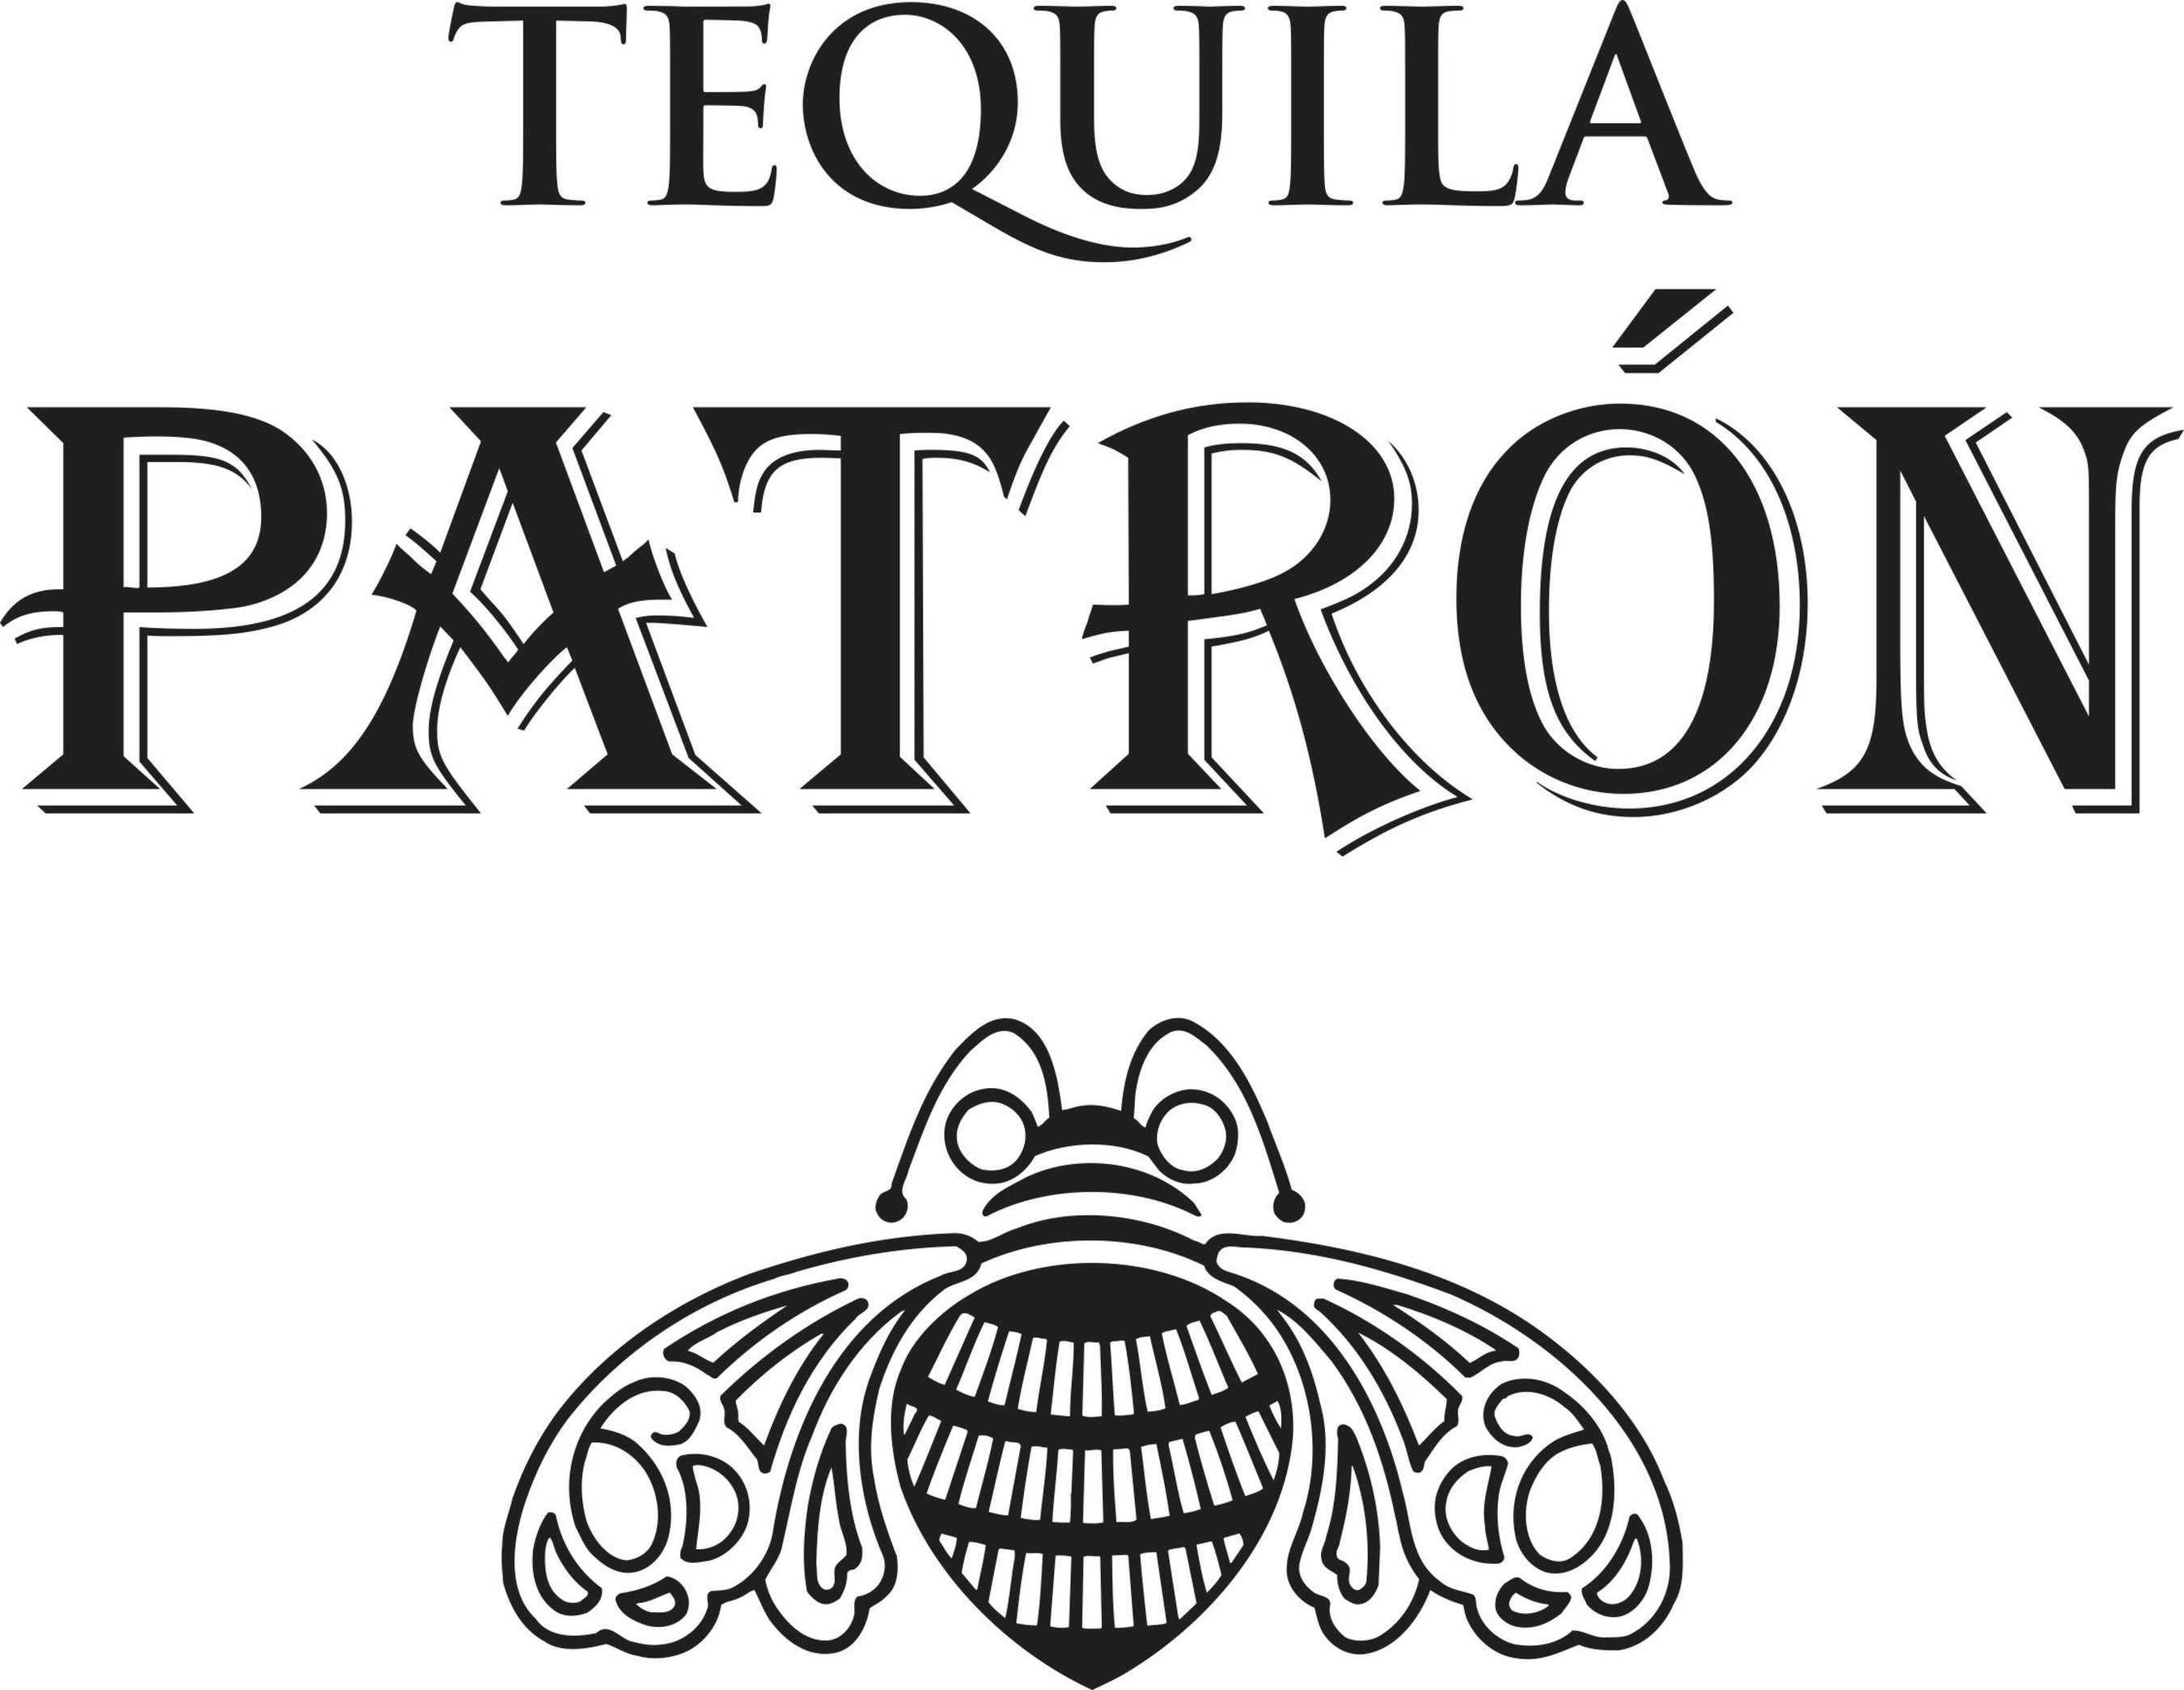 Patron Tequila (PRNewsFoto/Patron Tequila)